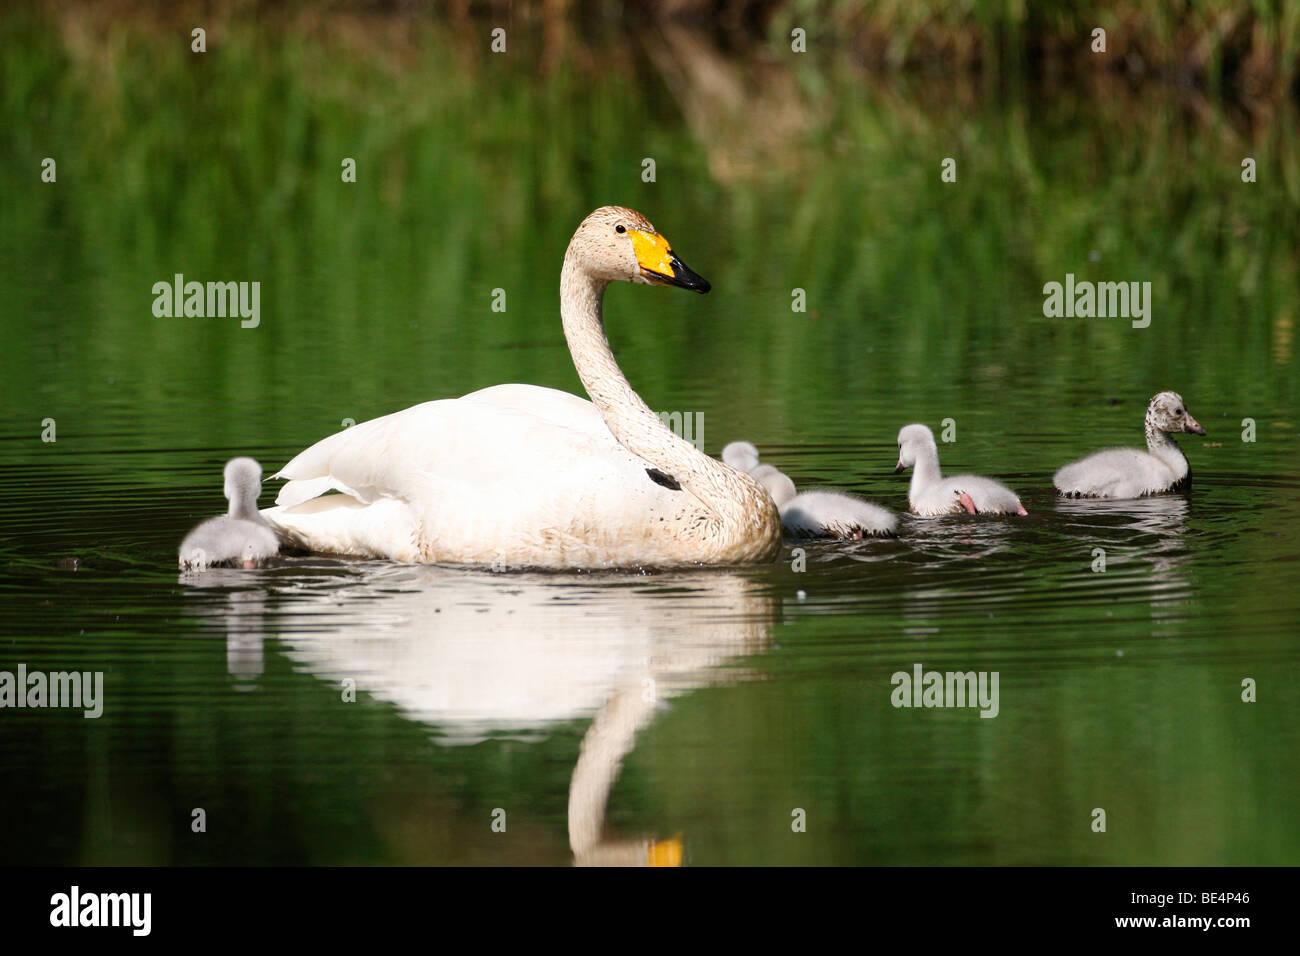 Whooper Swan (Cygnus cygnus) with chicks, Lapland, Finland, Europe Stock Photo